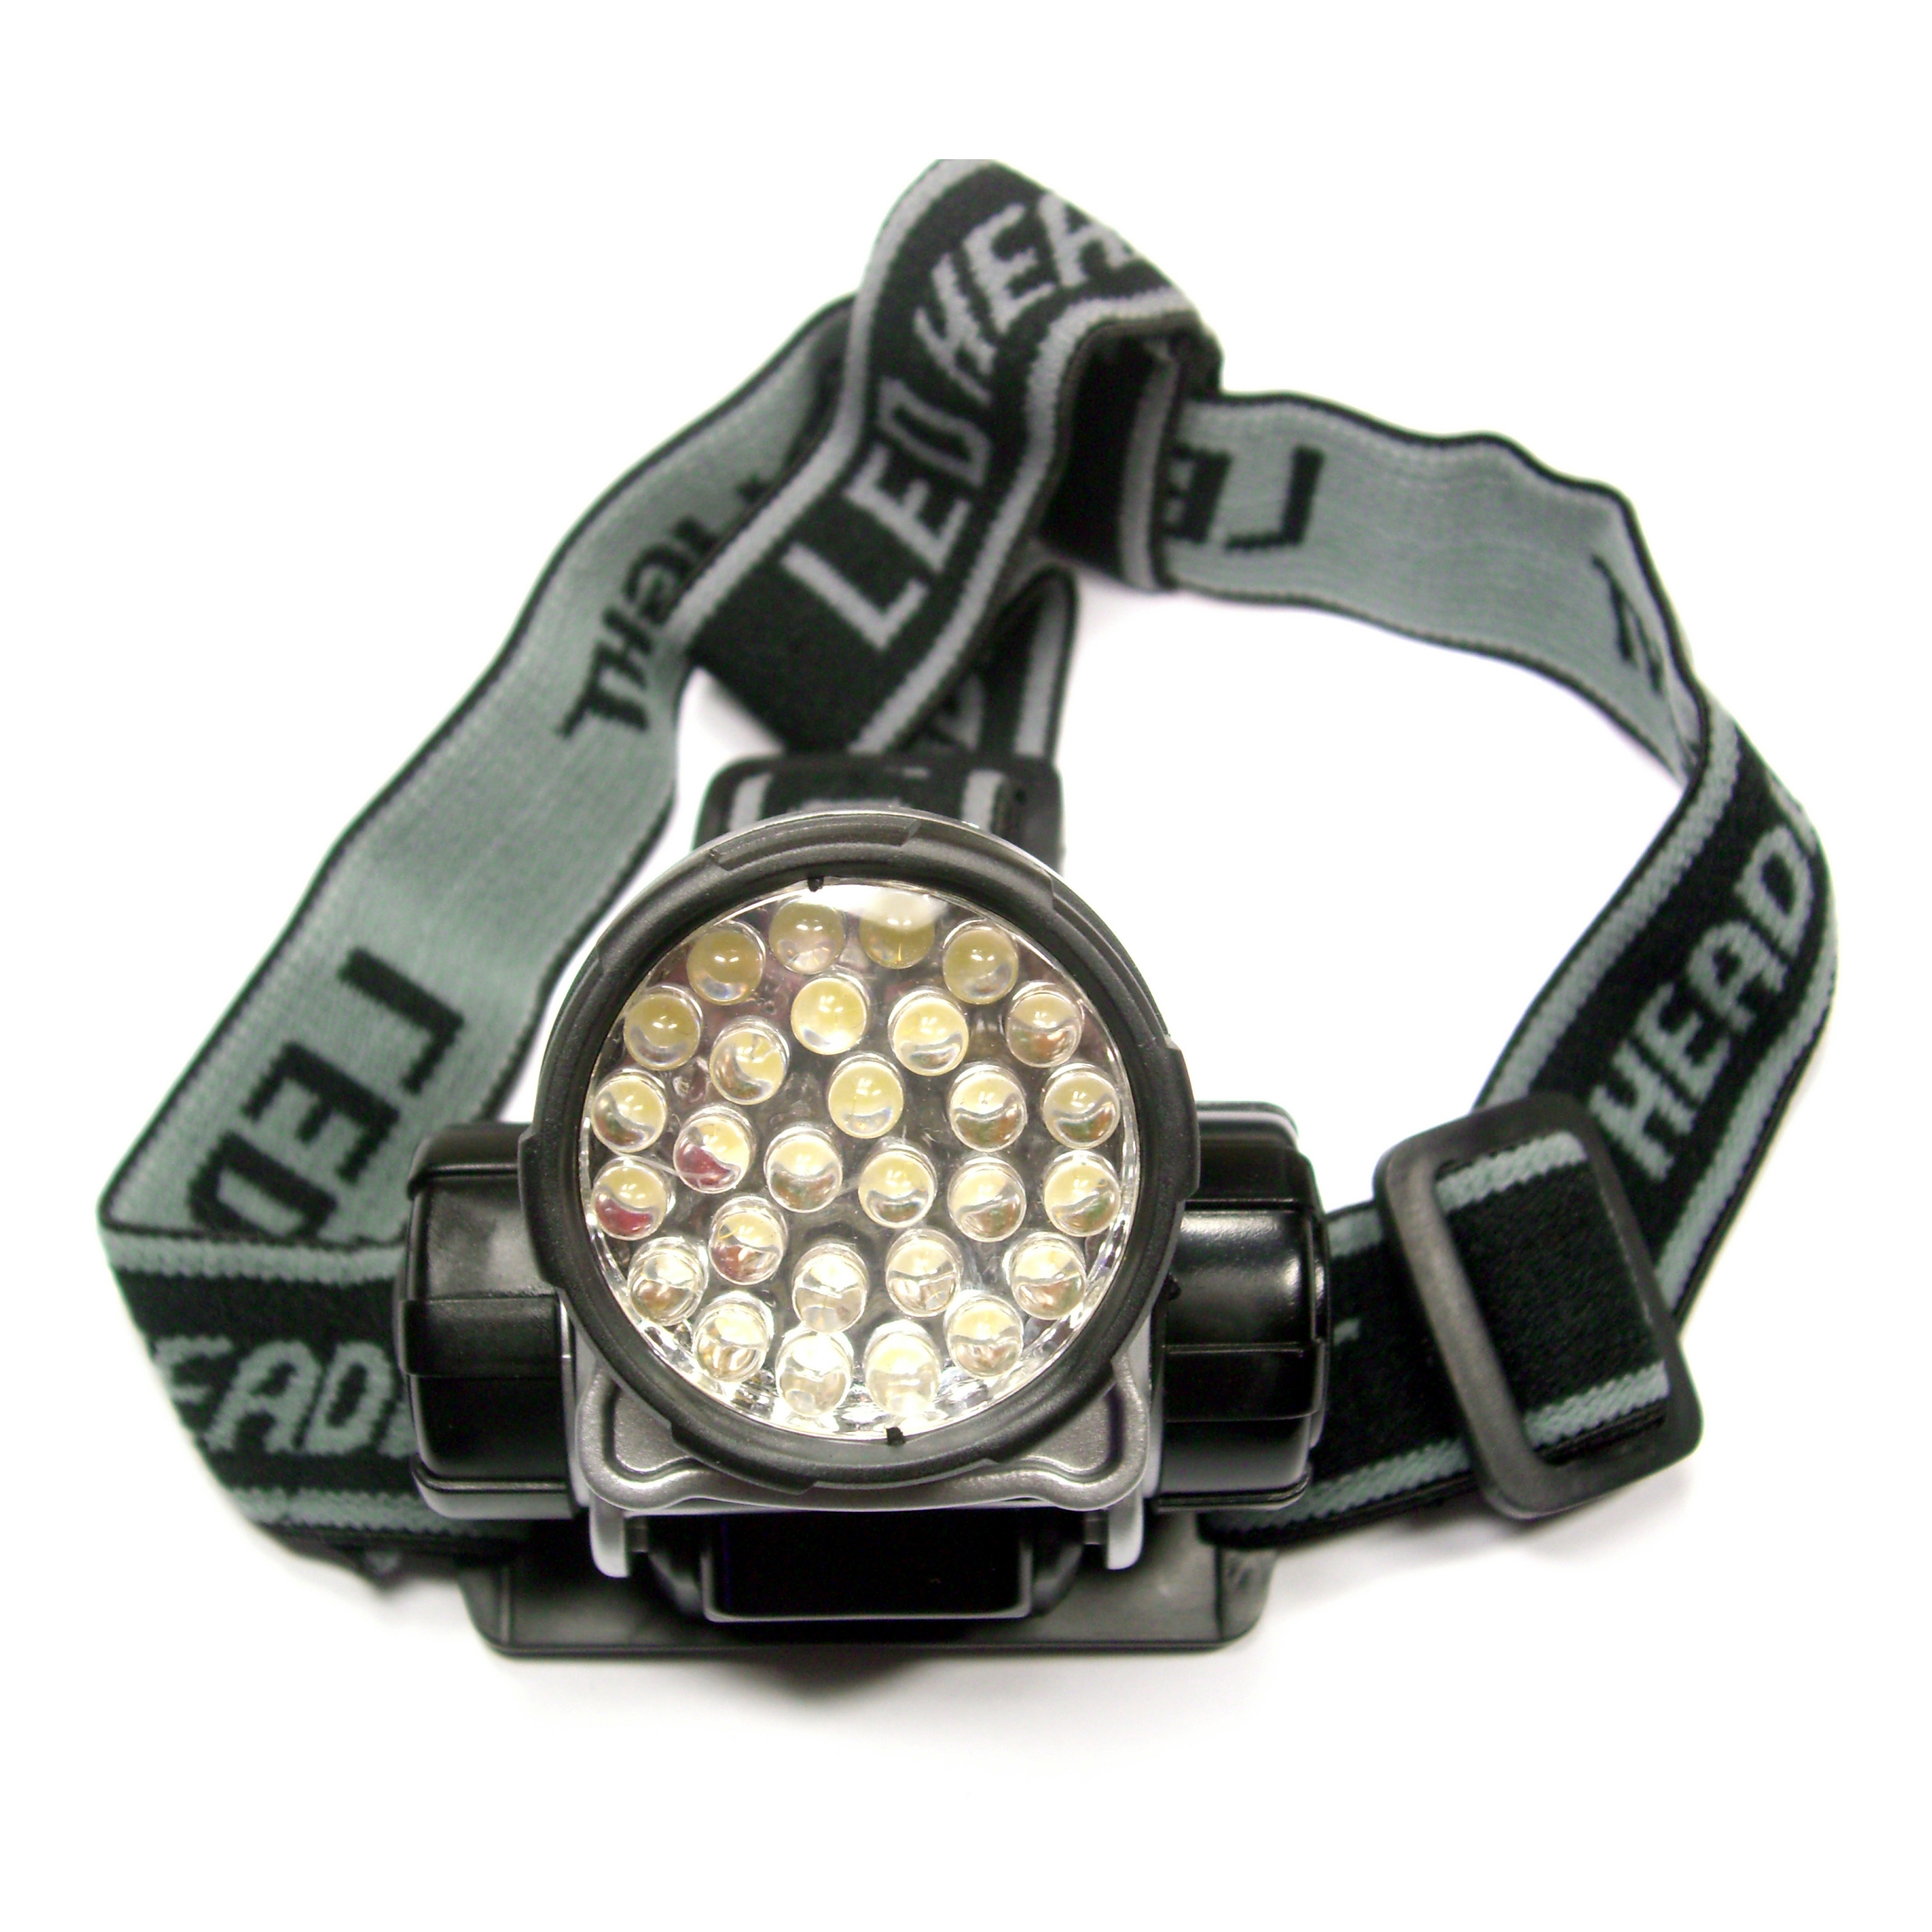 LED Stirnlampen Kopflampen